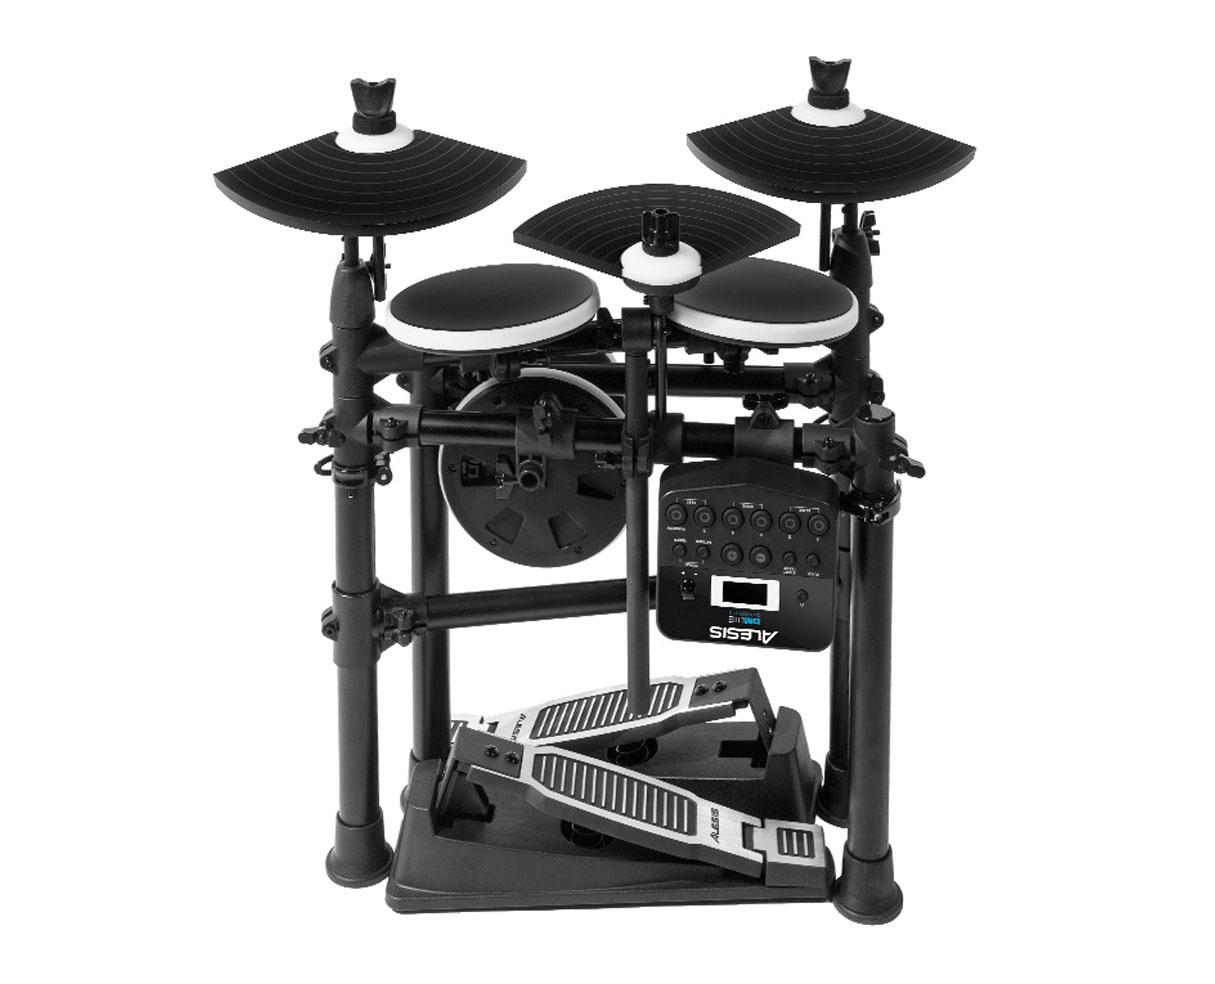 alesis dm lite kit electronic drumset with portable folding rack proaudiostar ebay. Black Bedroom Furniture Sets. Home Design Ideas